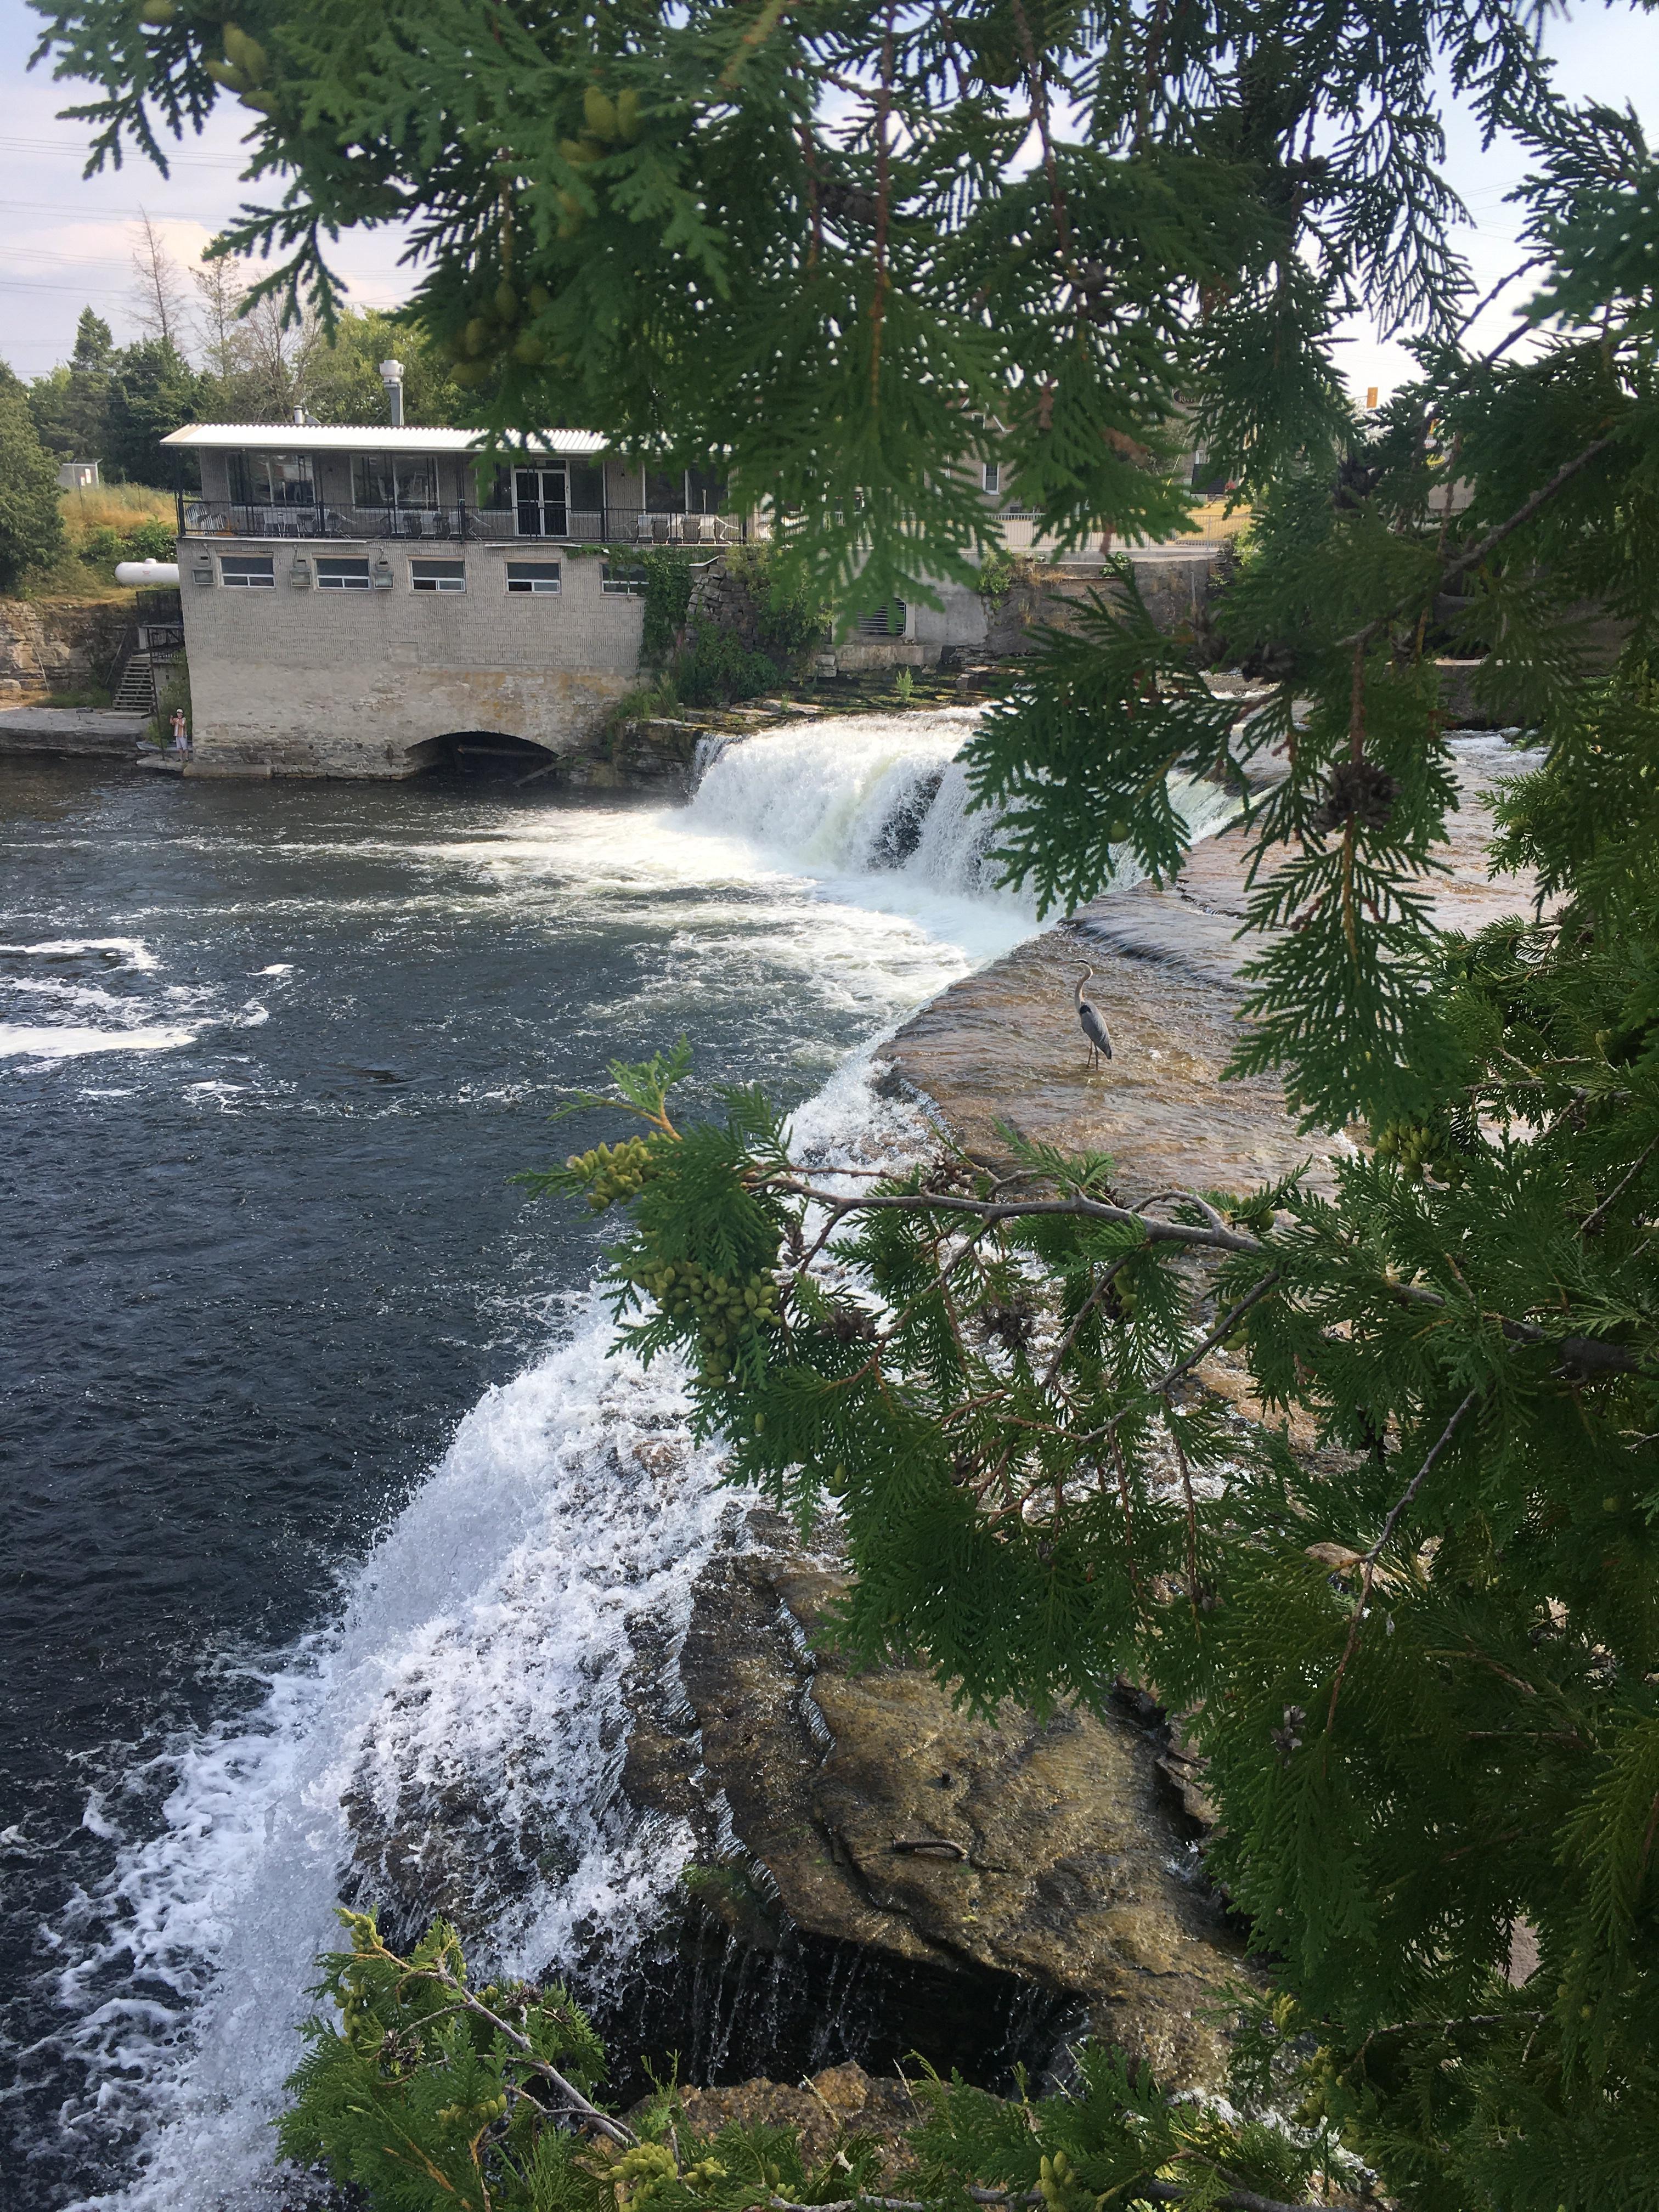 Fenelon Falls Waterfall and Blue Heron